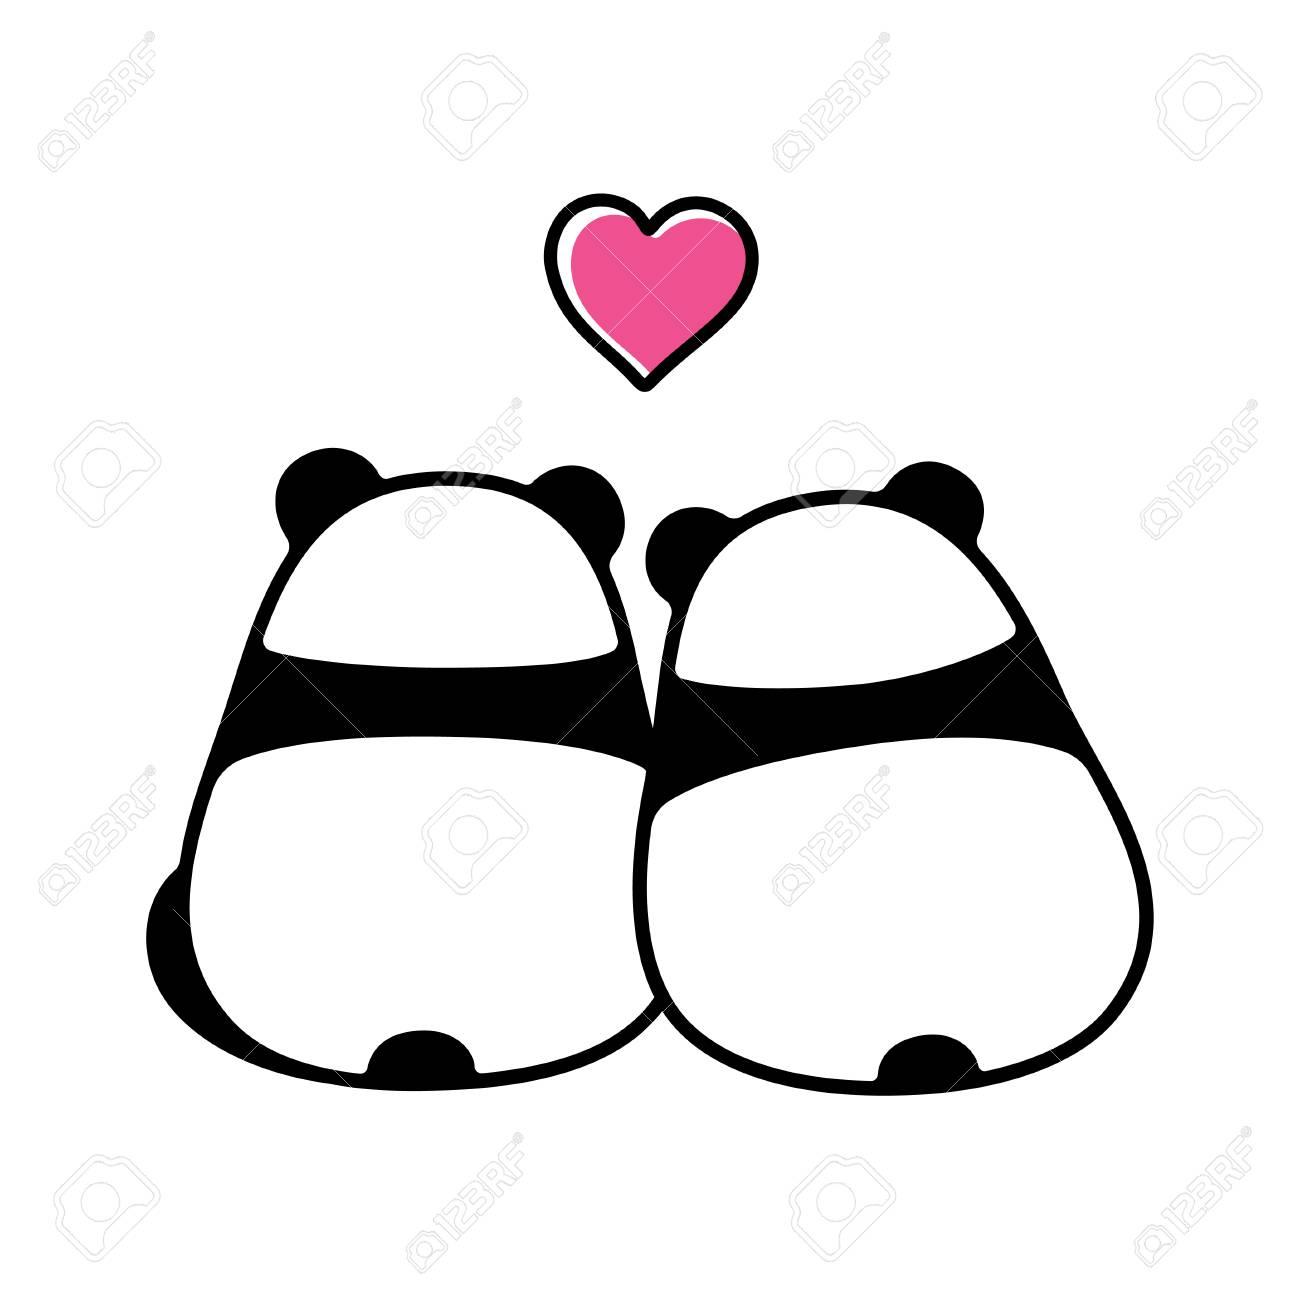 cute panda couple in love simple and minimal cartoon drawing